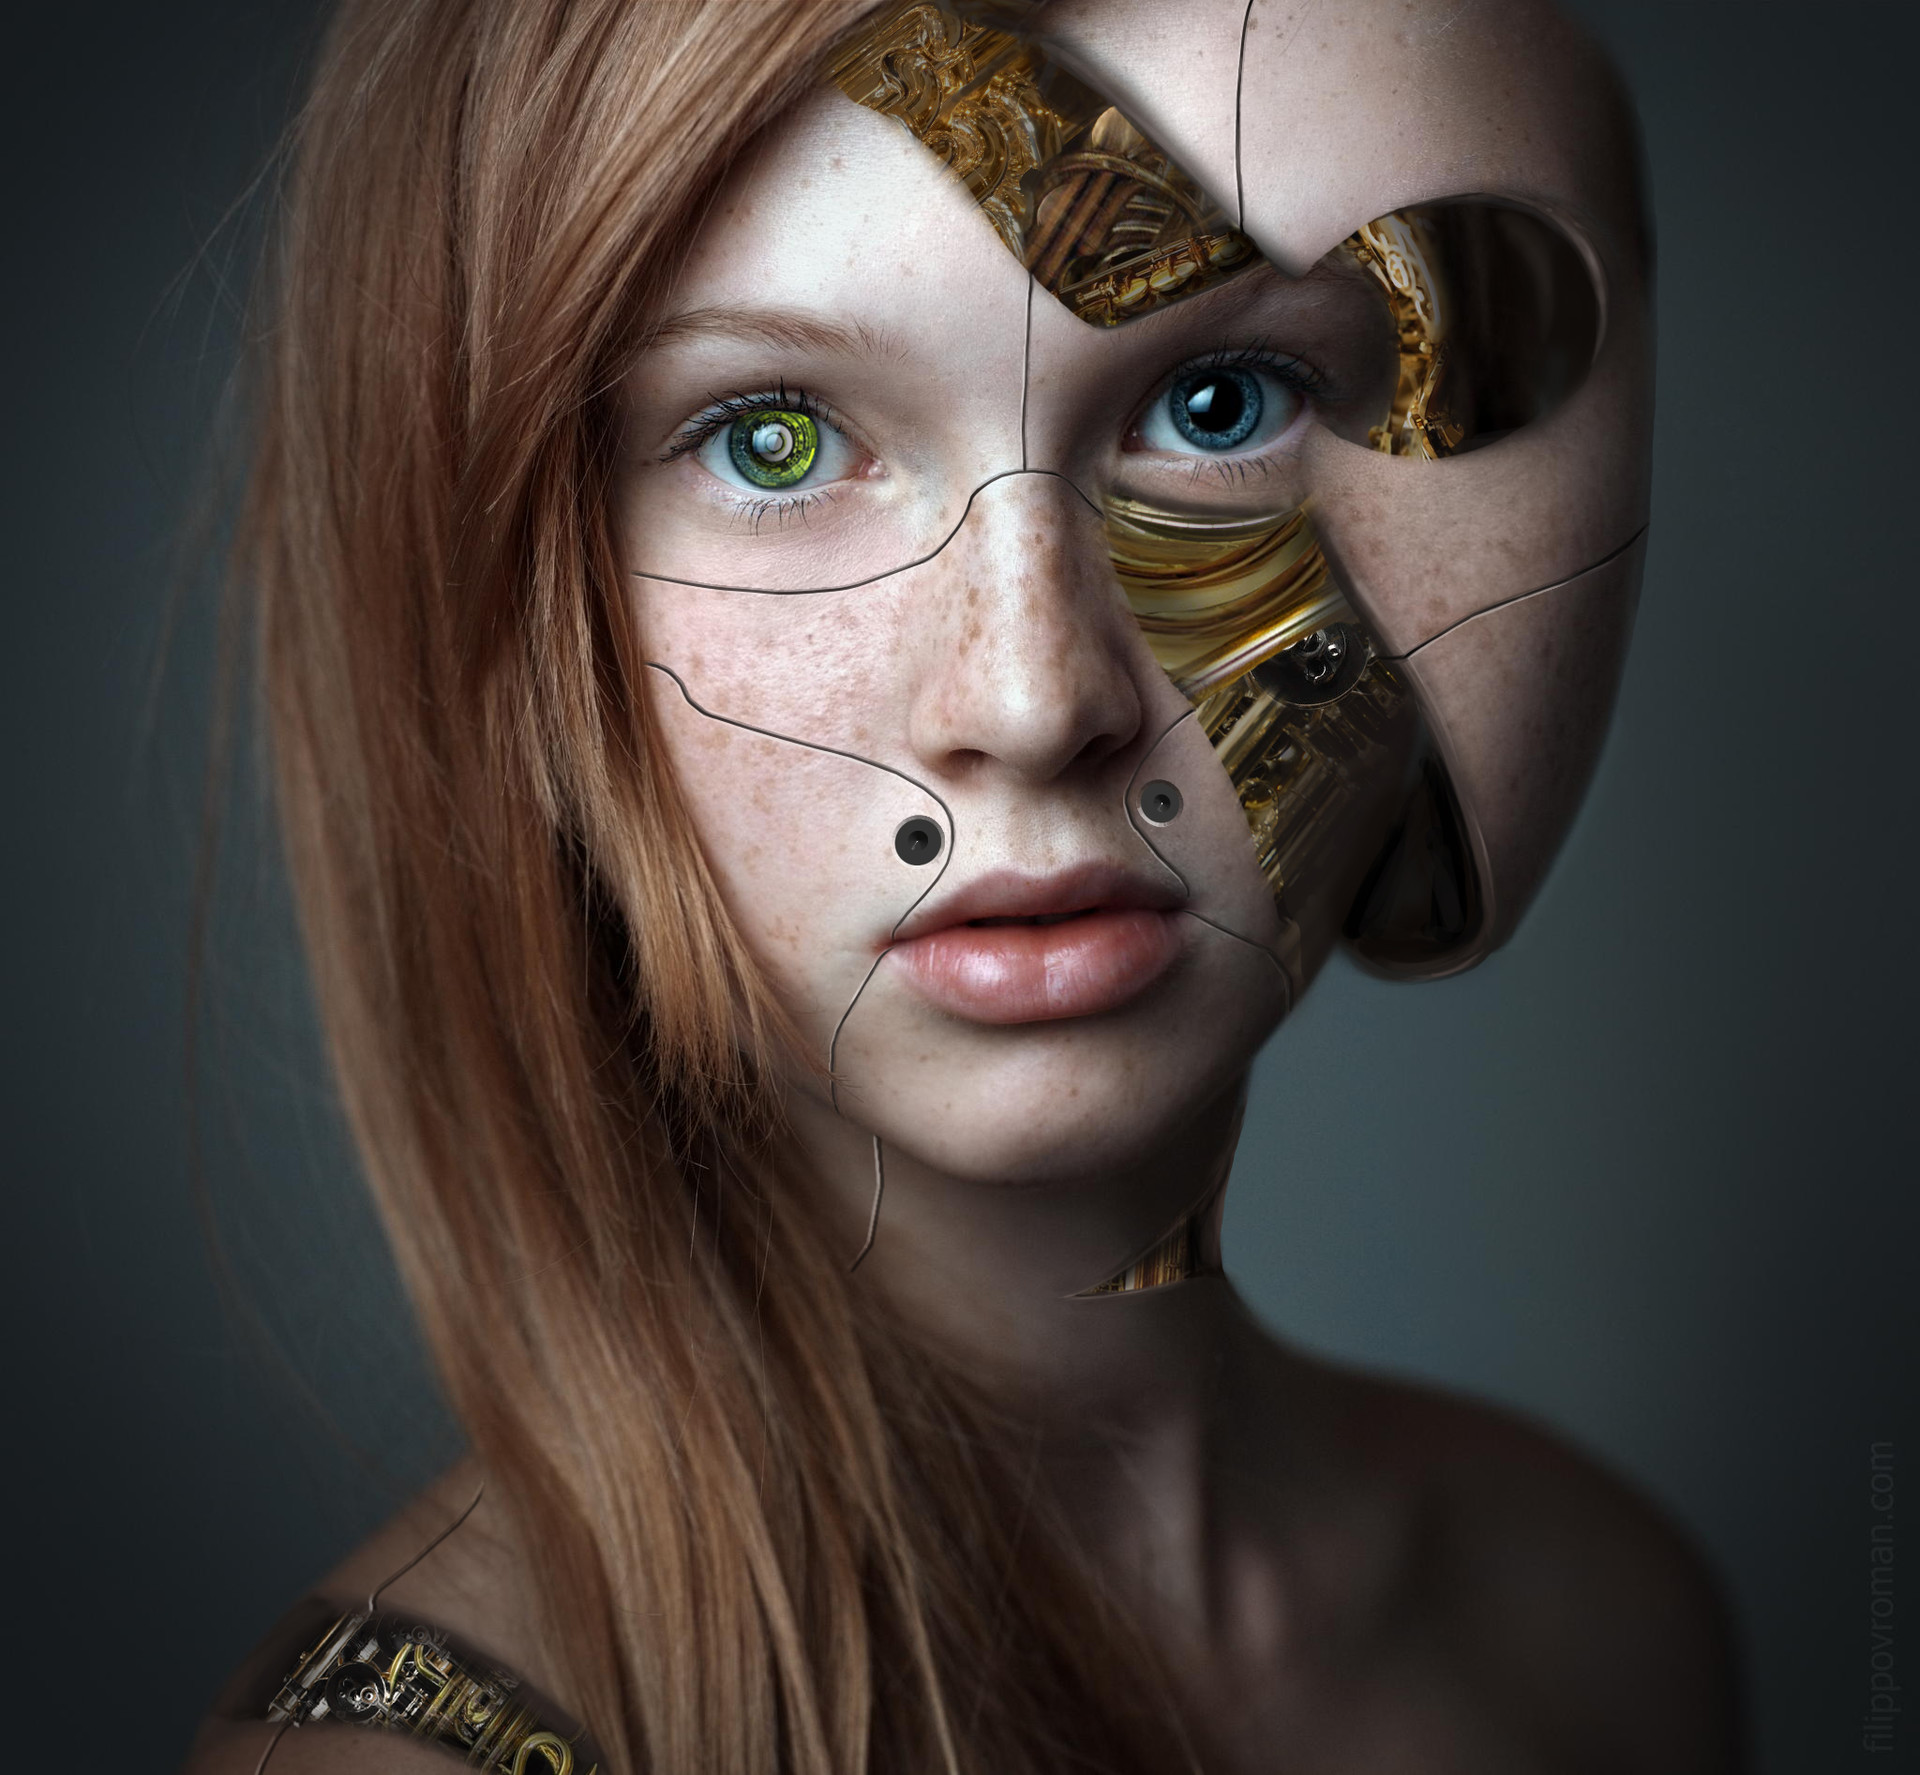 teenage-girl-portrait-furry-tentacle-porn